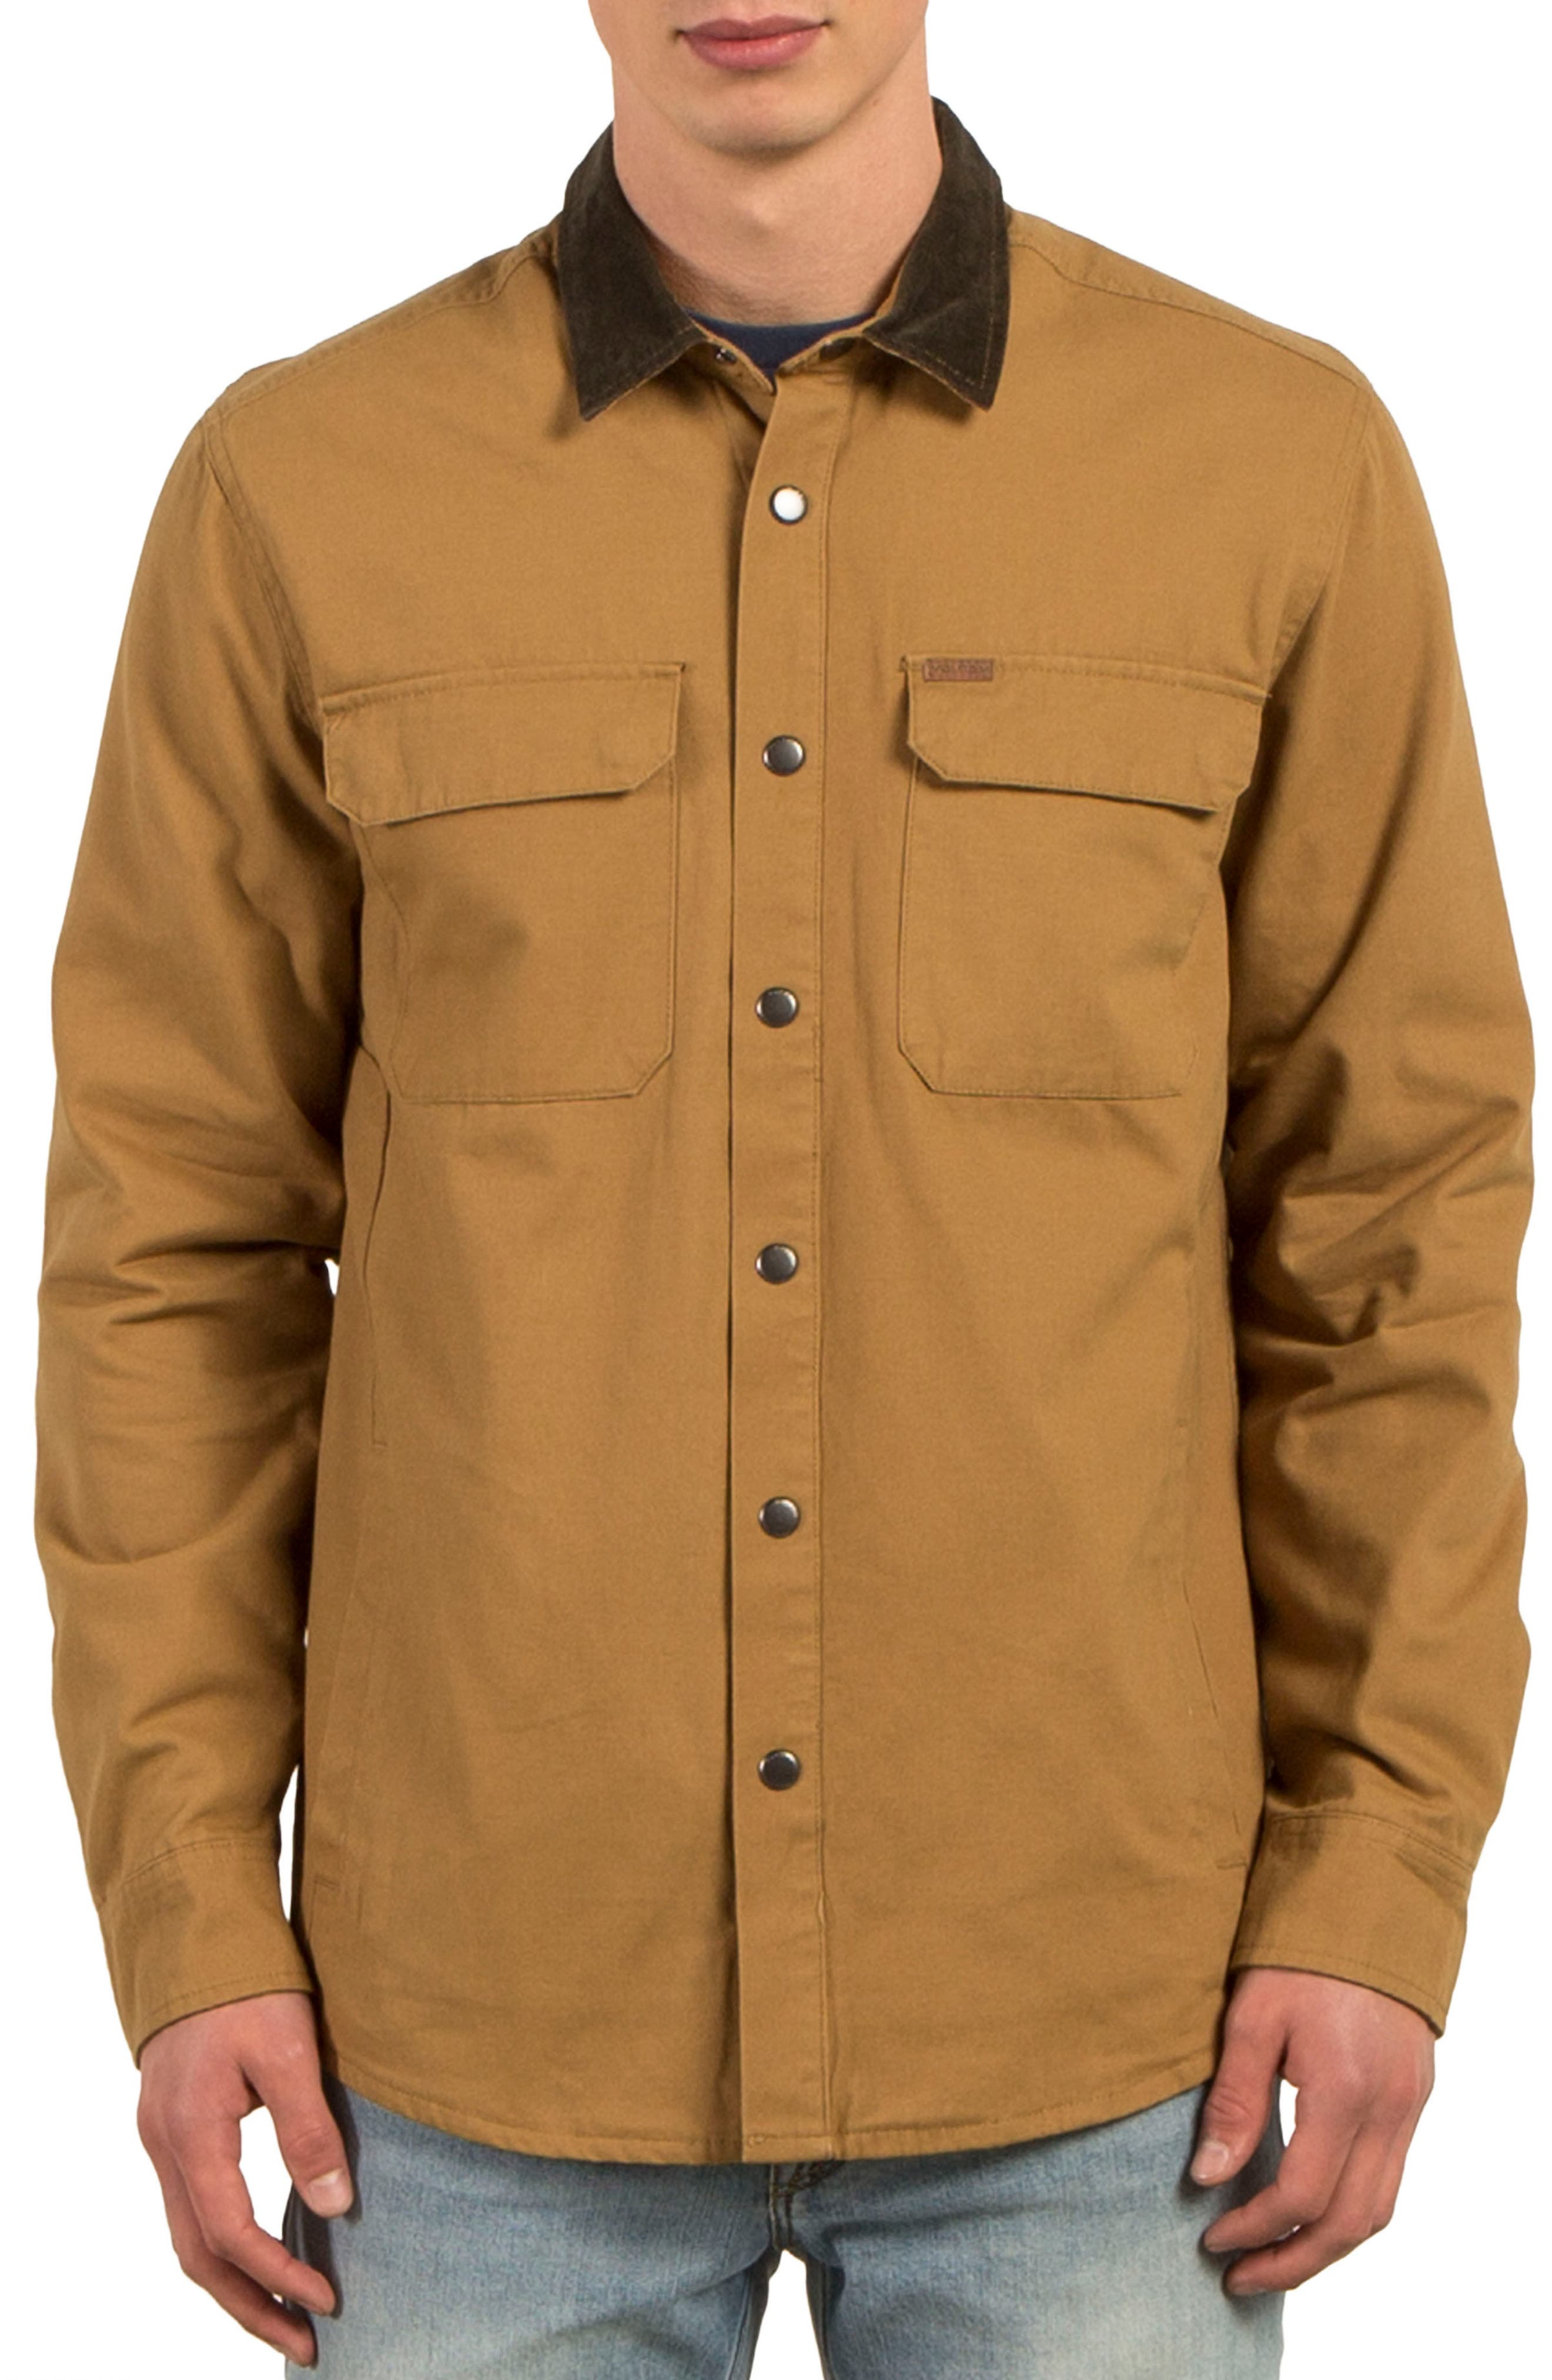 Larkin Classic Fit Jacket,                         Main,                         color, Beige